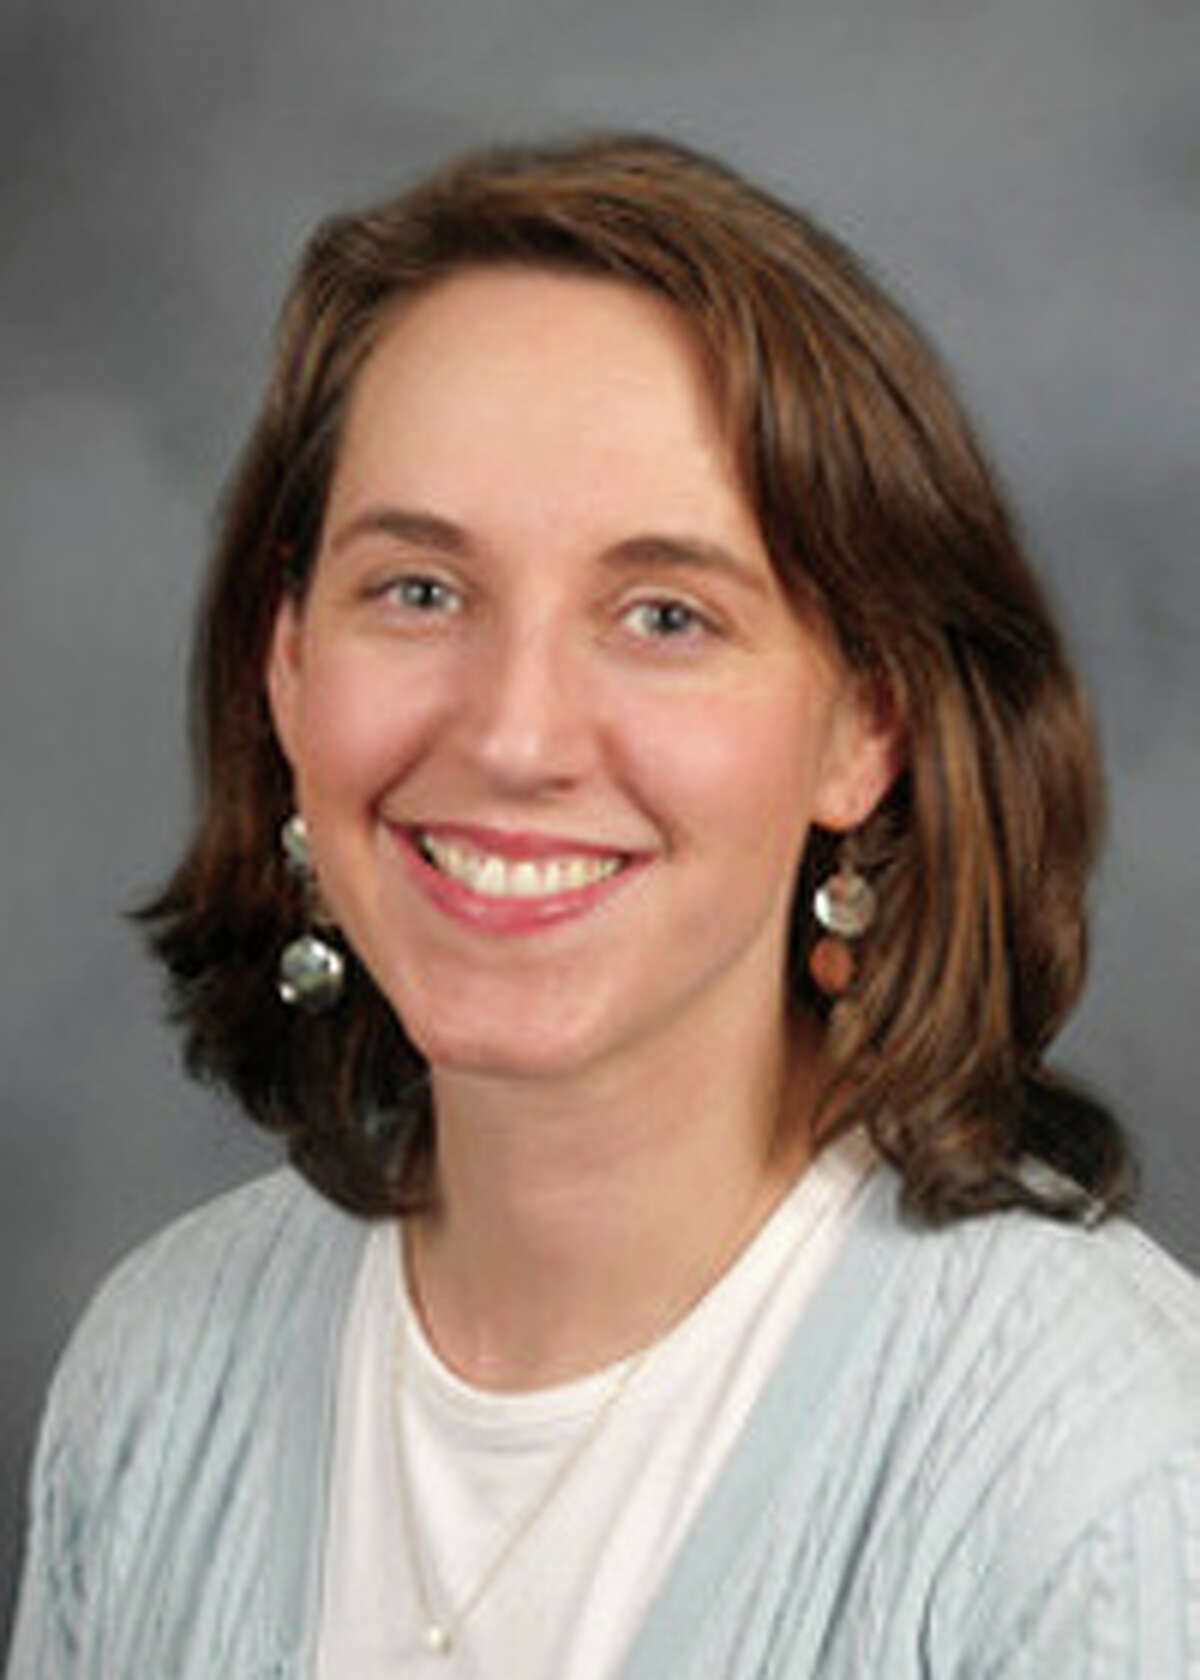 Susan Kaech, associate professor of immunobiology in the Yale University School of Medicine in New Haven, Conn.